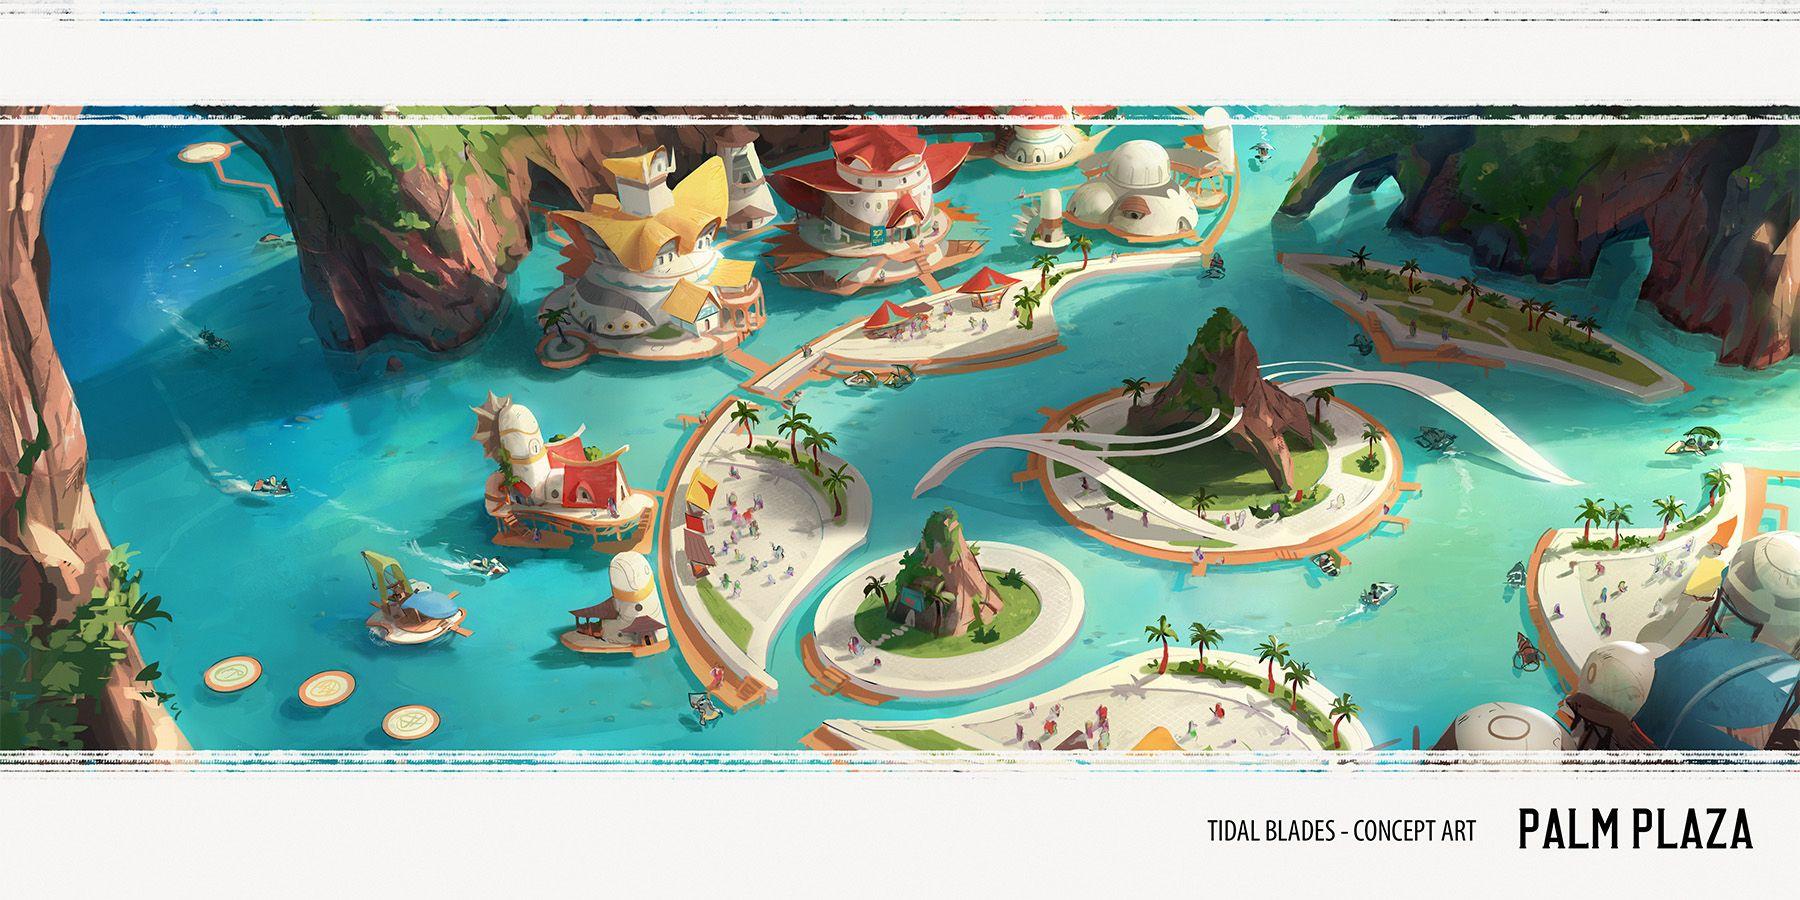 Tidal Blades: Heroes of the Reef - Artist Diary #1 | Tidal Blades